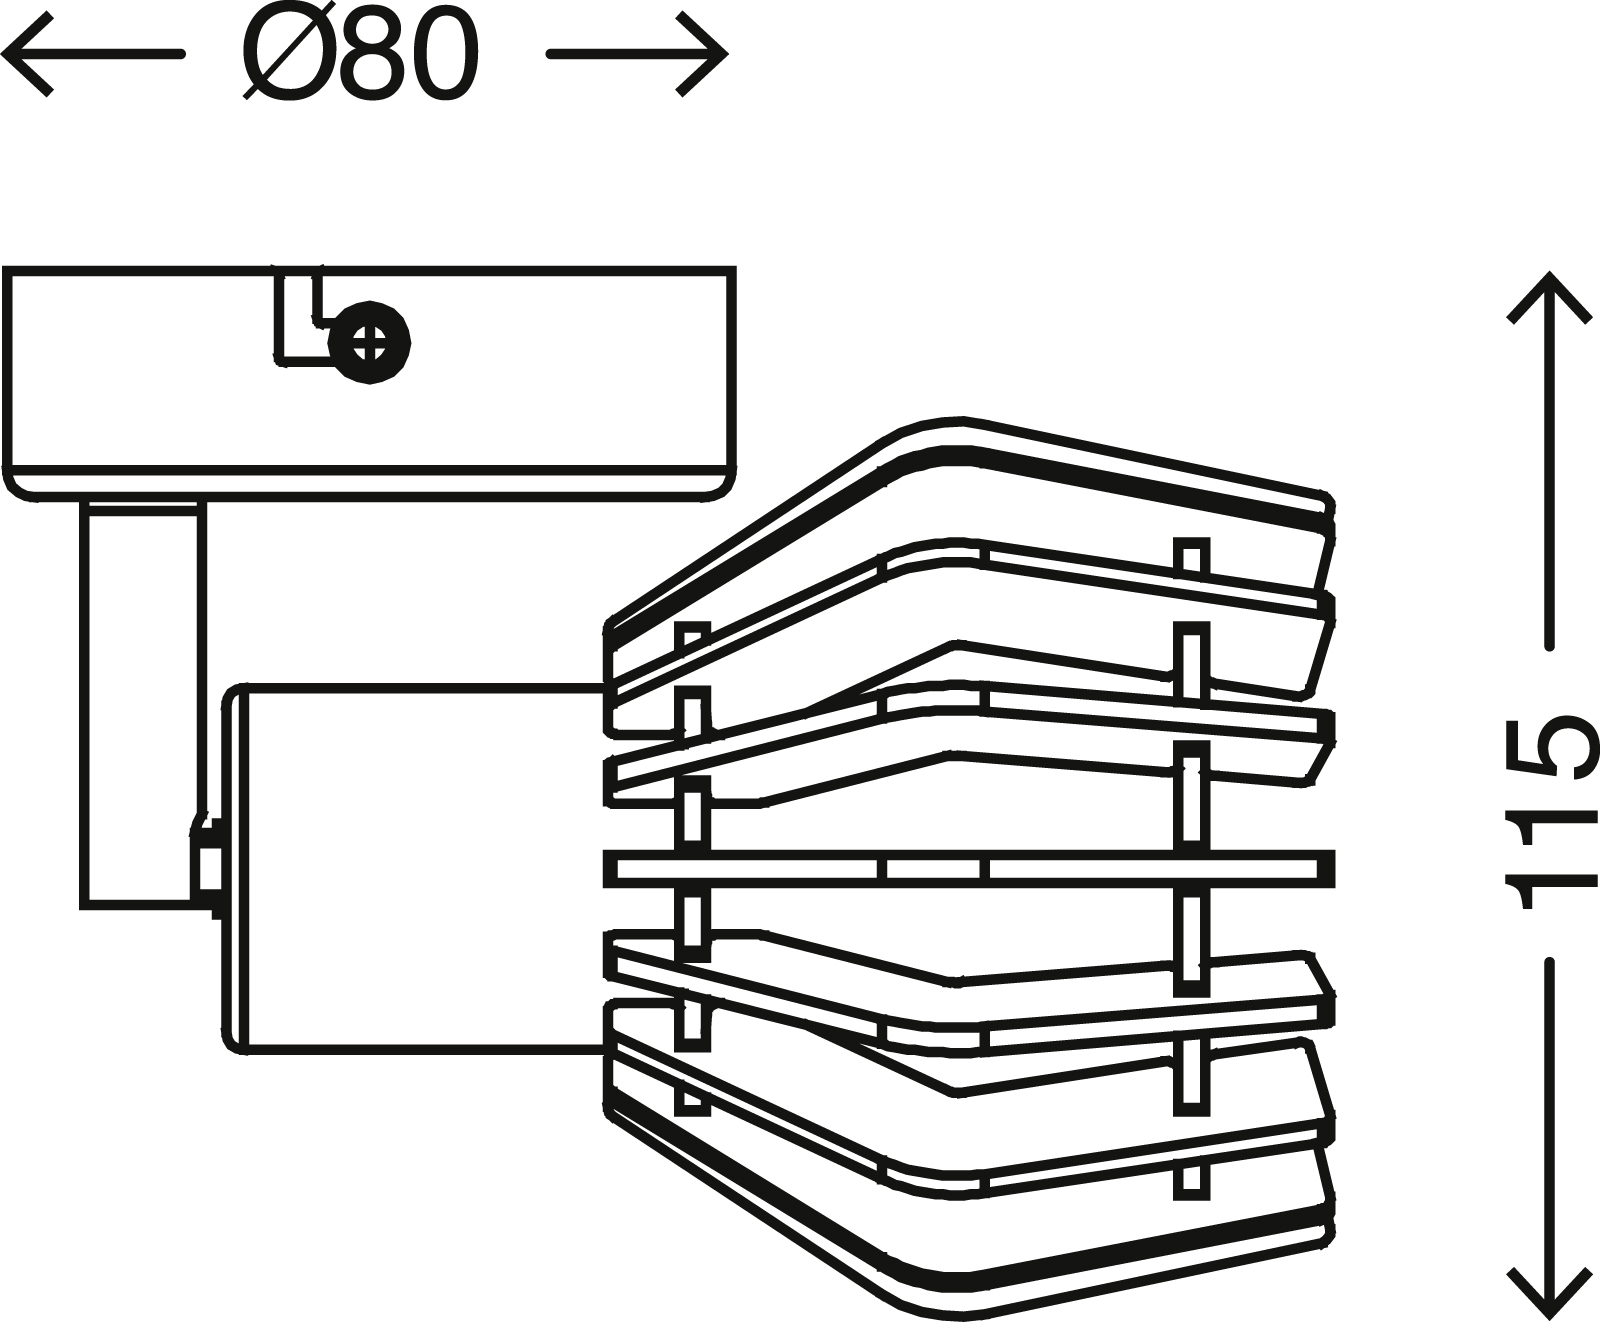 LED Spot Wandleuchte, Ø 8 cm, max. 5,5 W, Schwarz-Gold-Holz